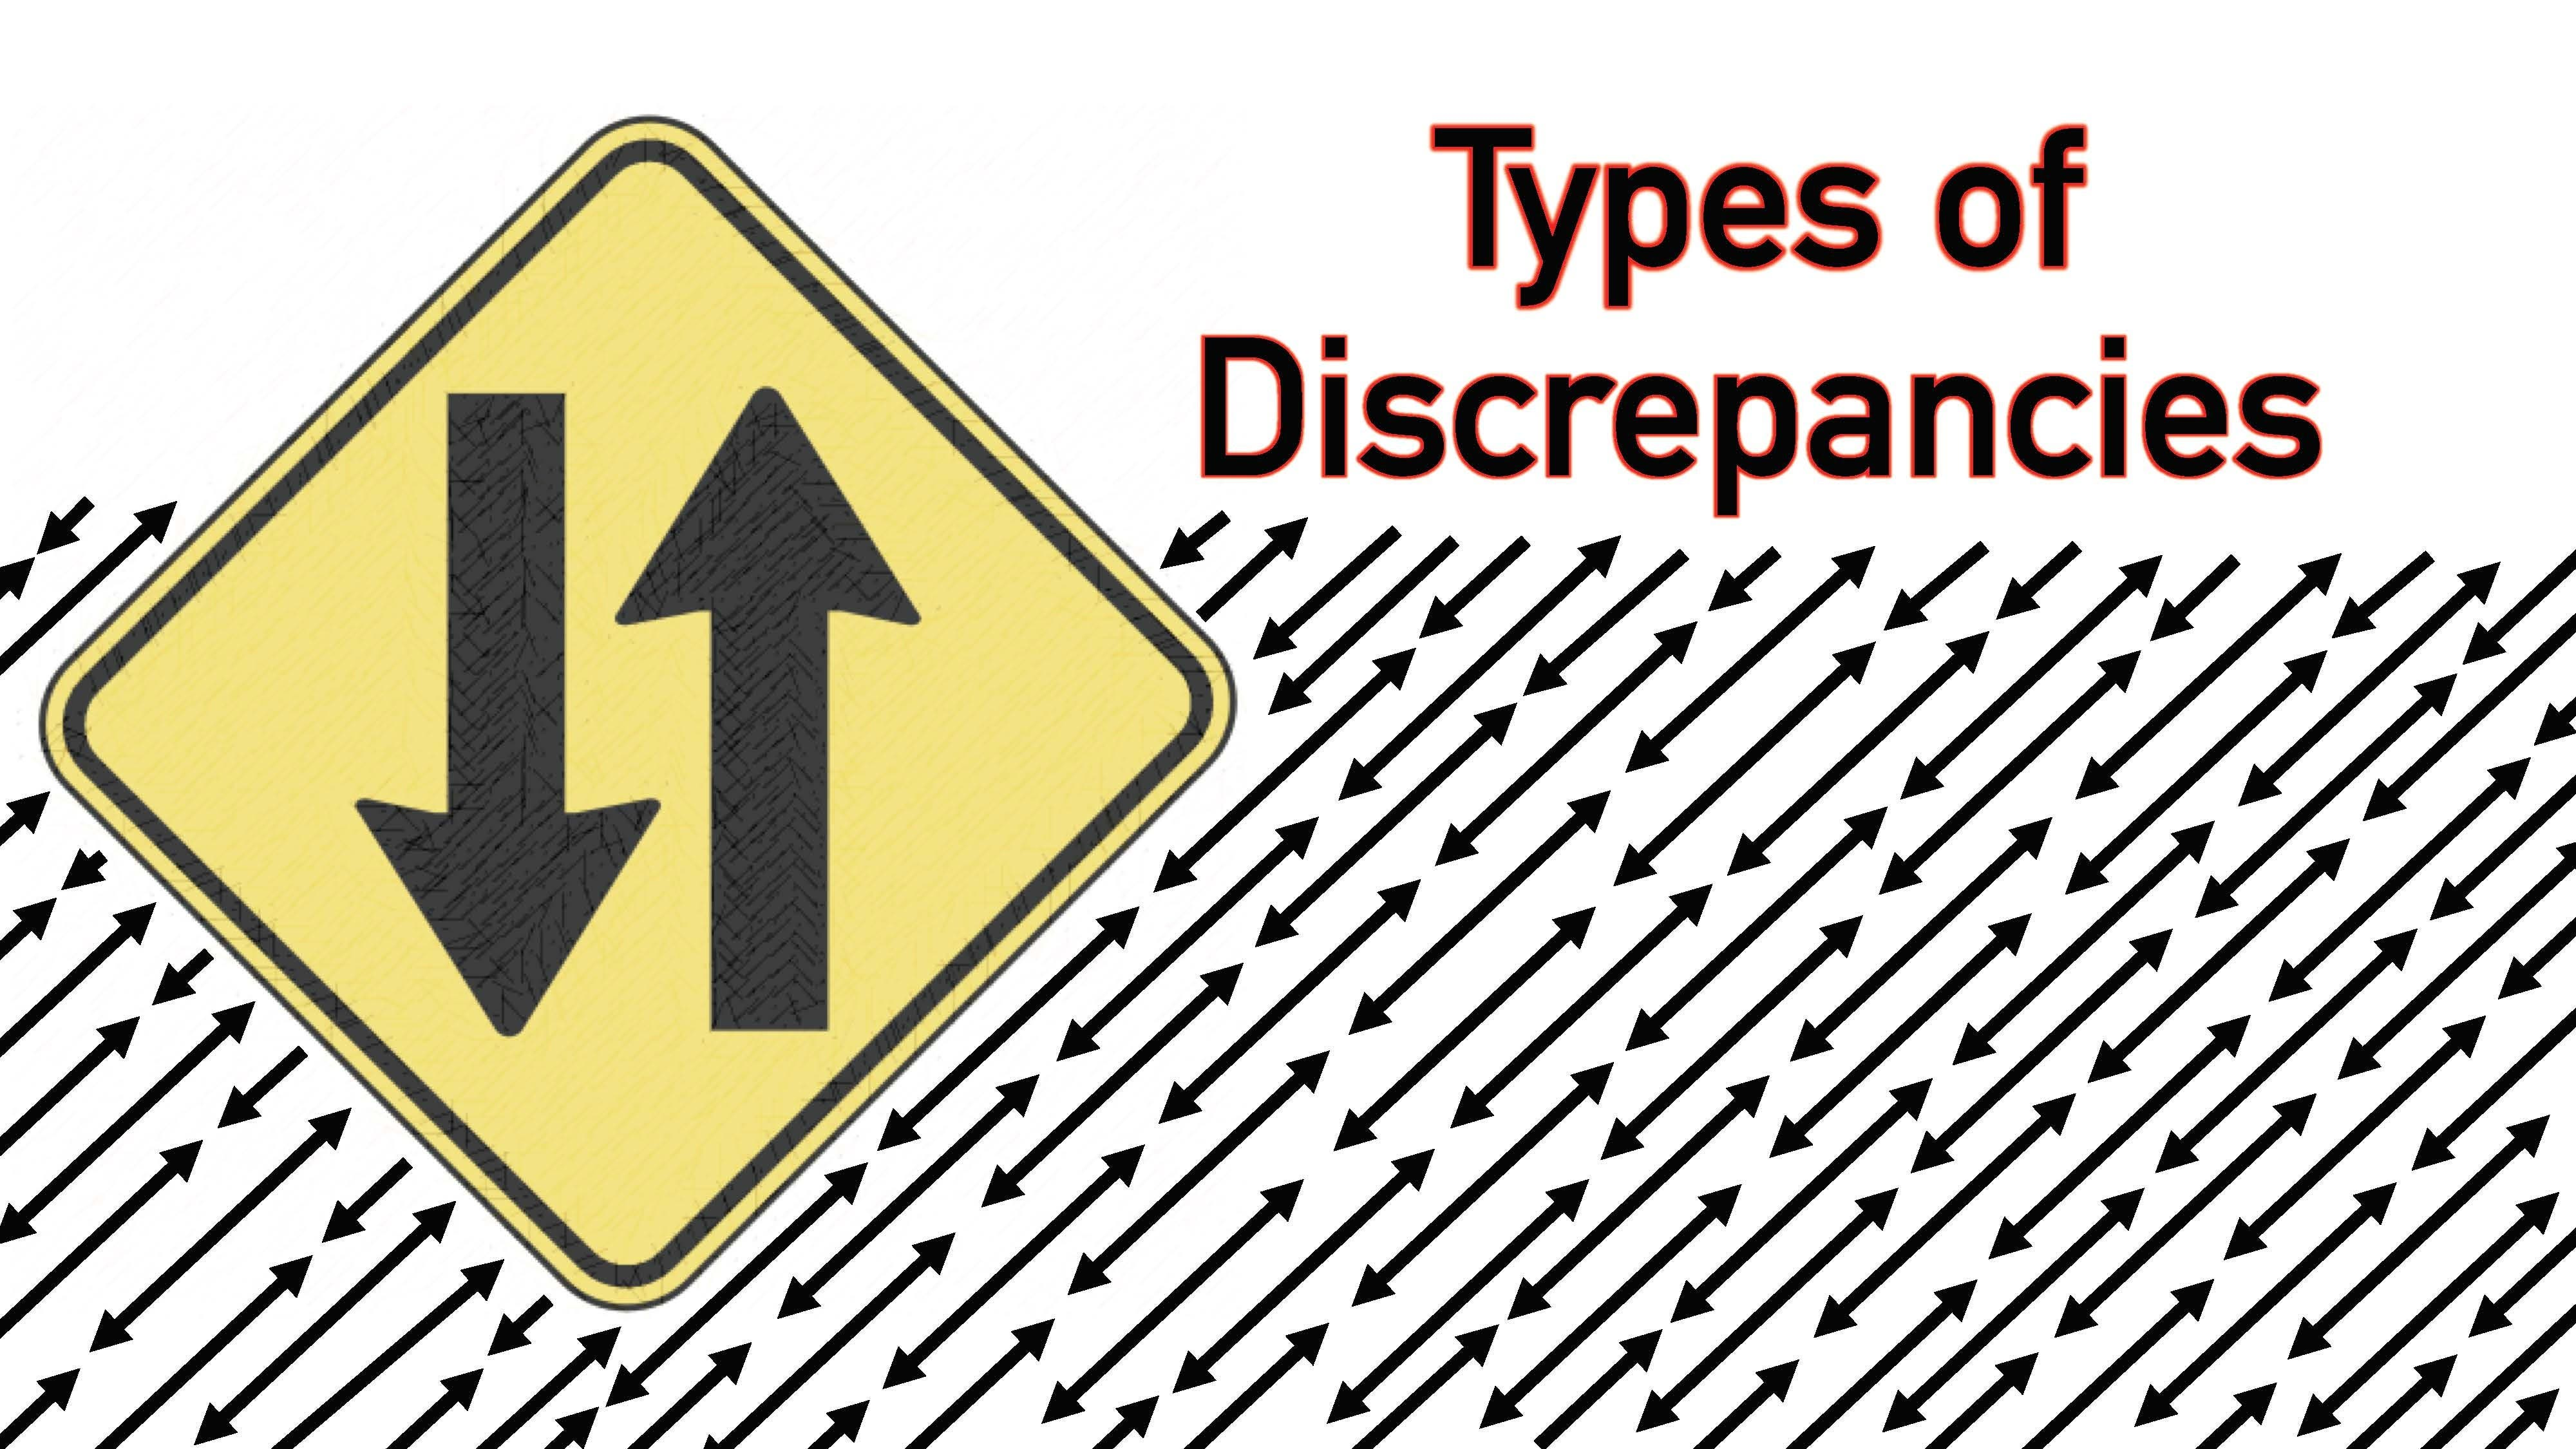 Types of Discrepancies